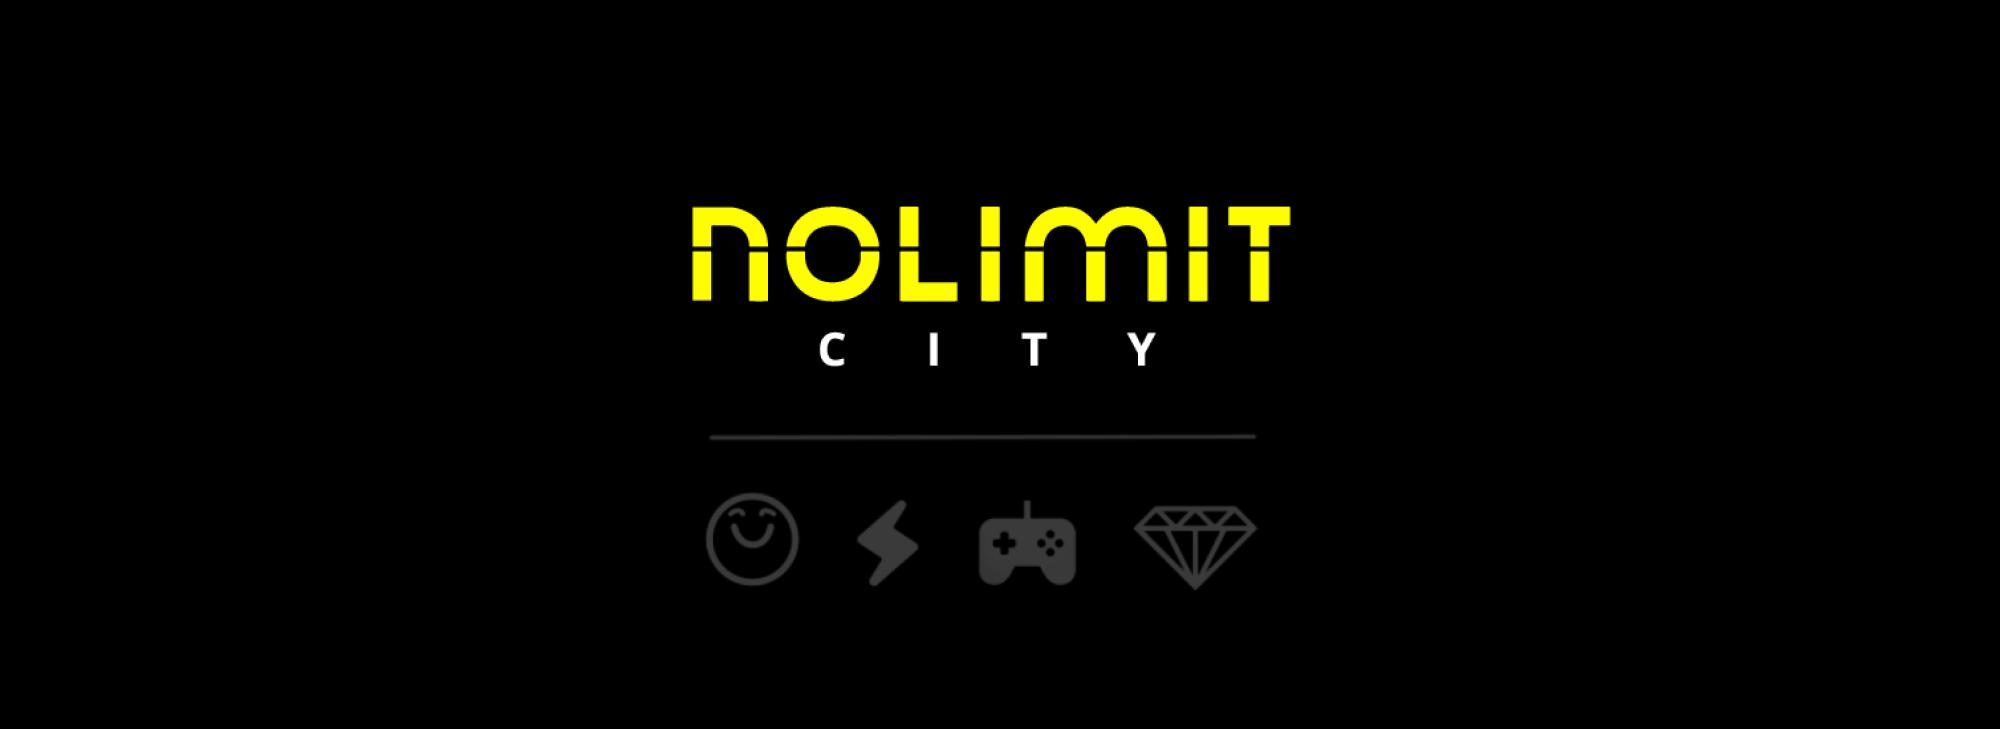 No Limit City社が復活!